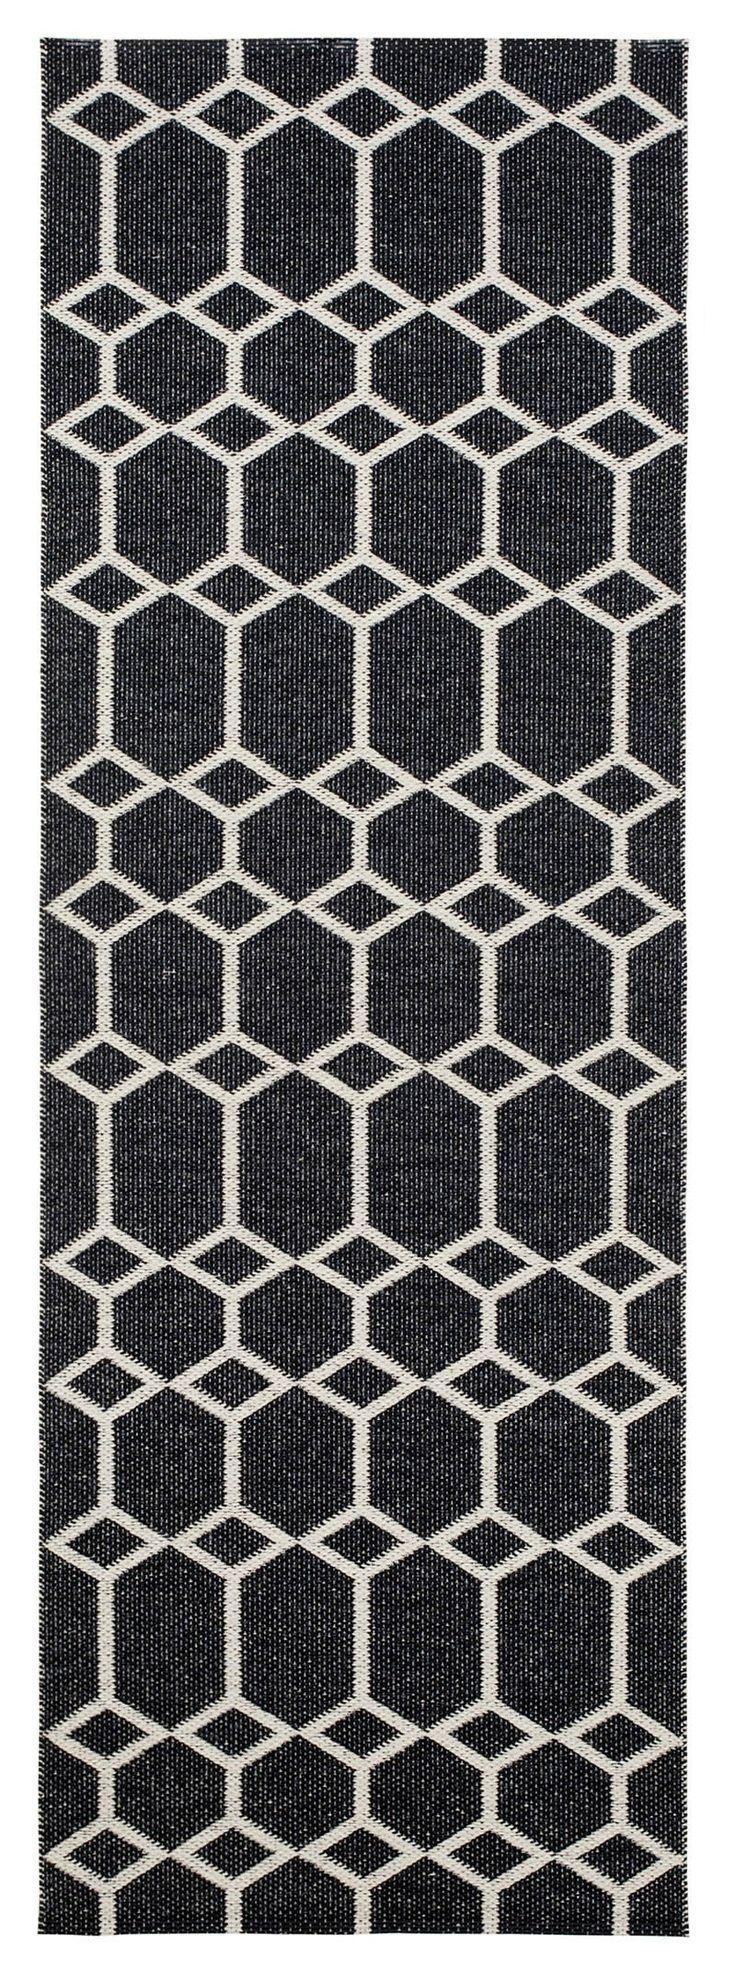 Teppich retro  1000+ ideas about Retro Teppiche on Pinterest | Sofa mit ...